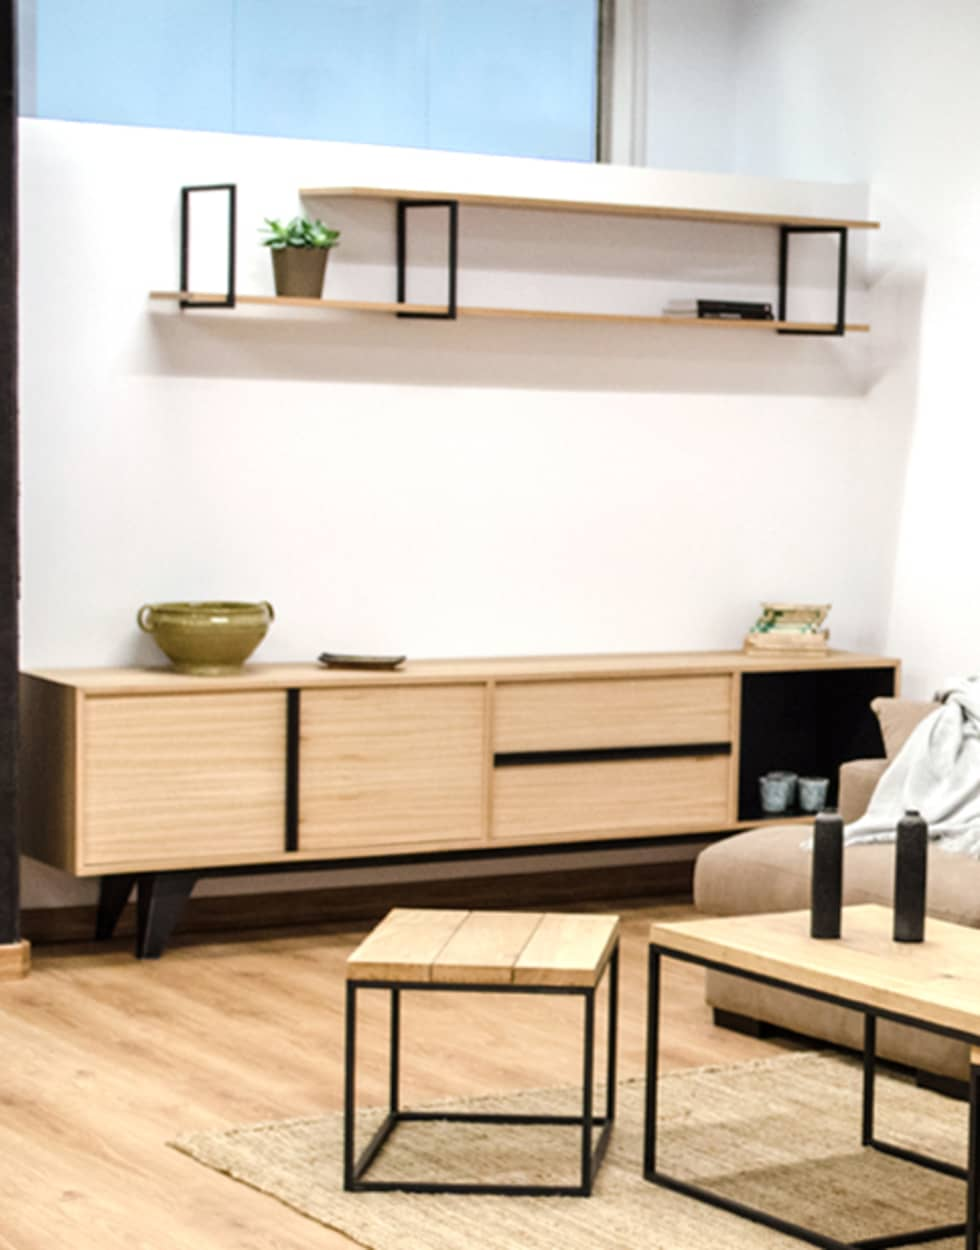 Muebles de madera para salon mueble de saln modular - Muebles de madera maciza para salon ...